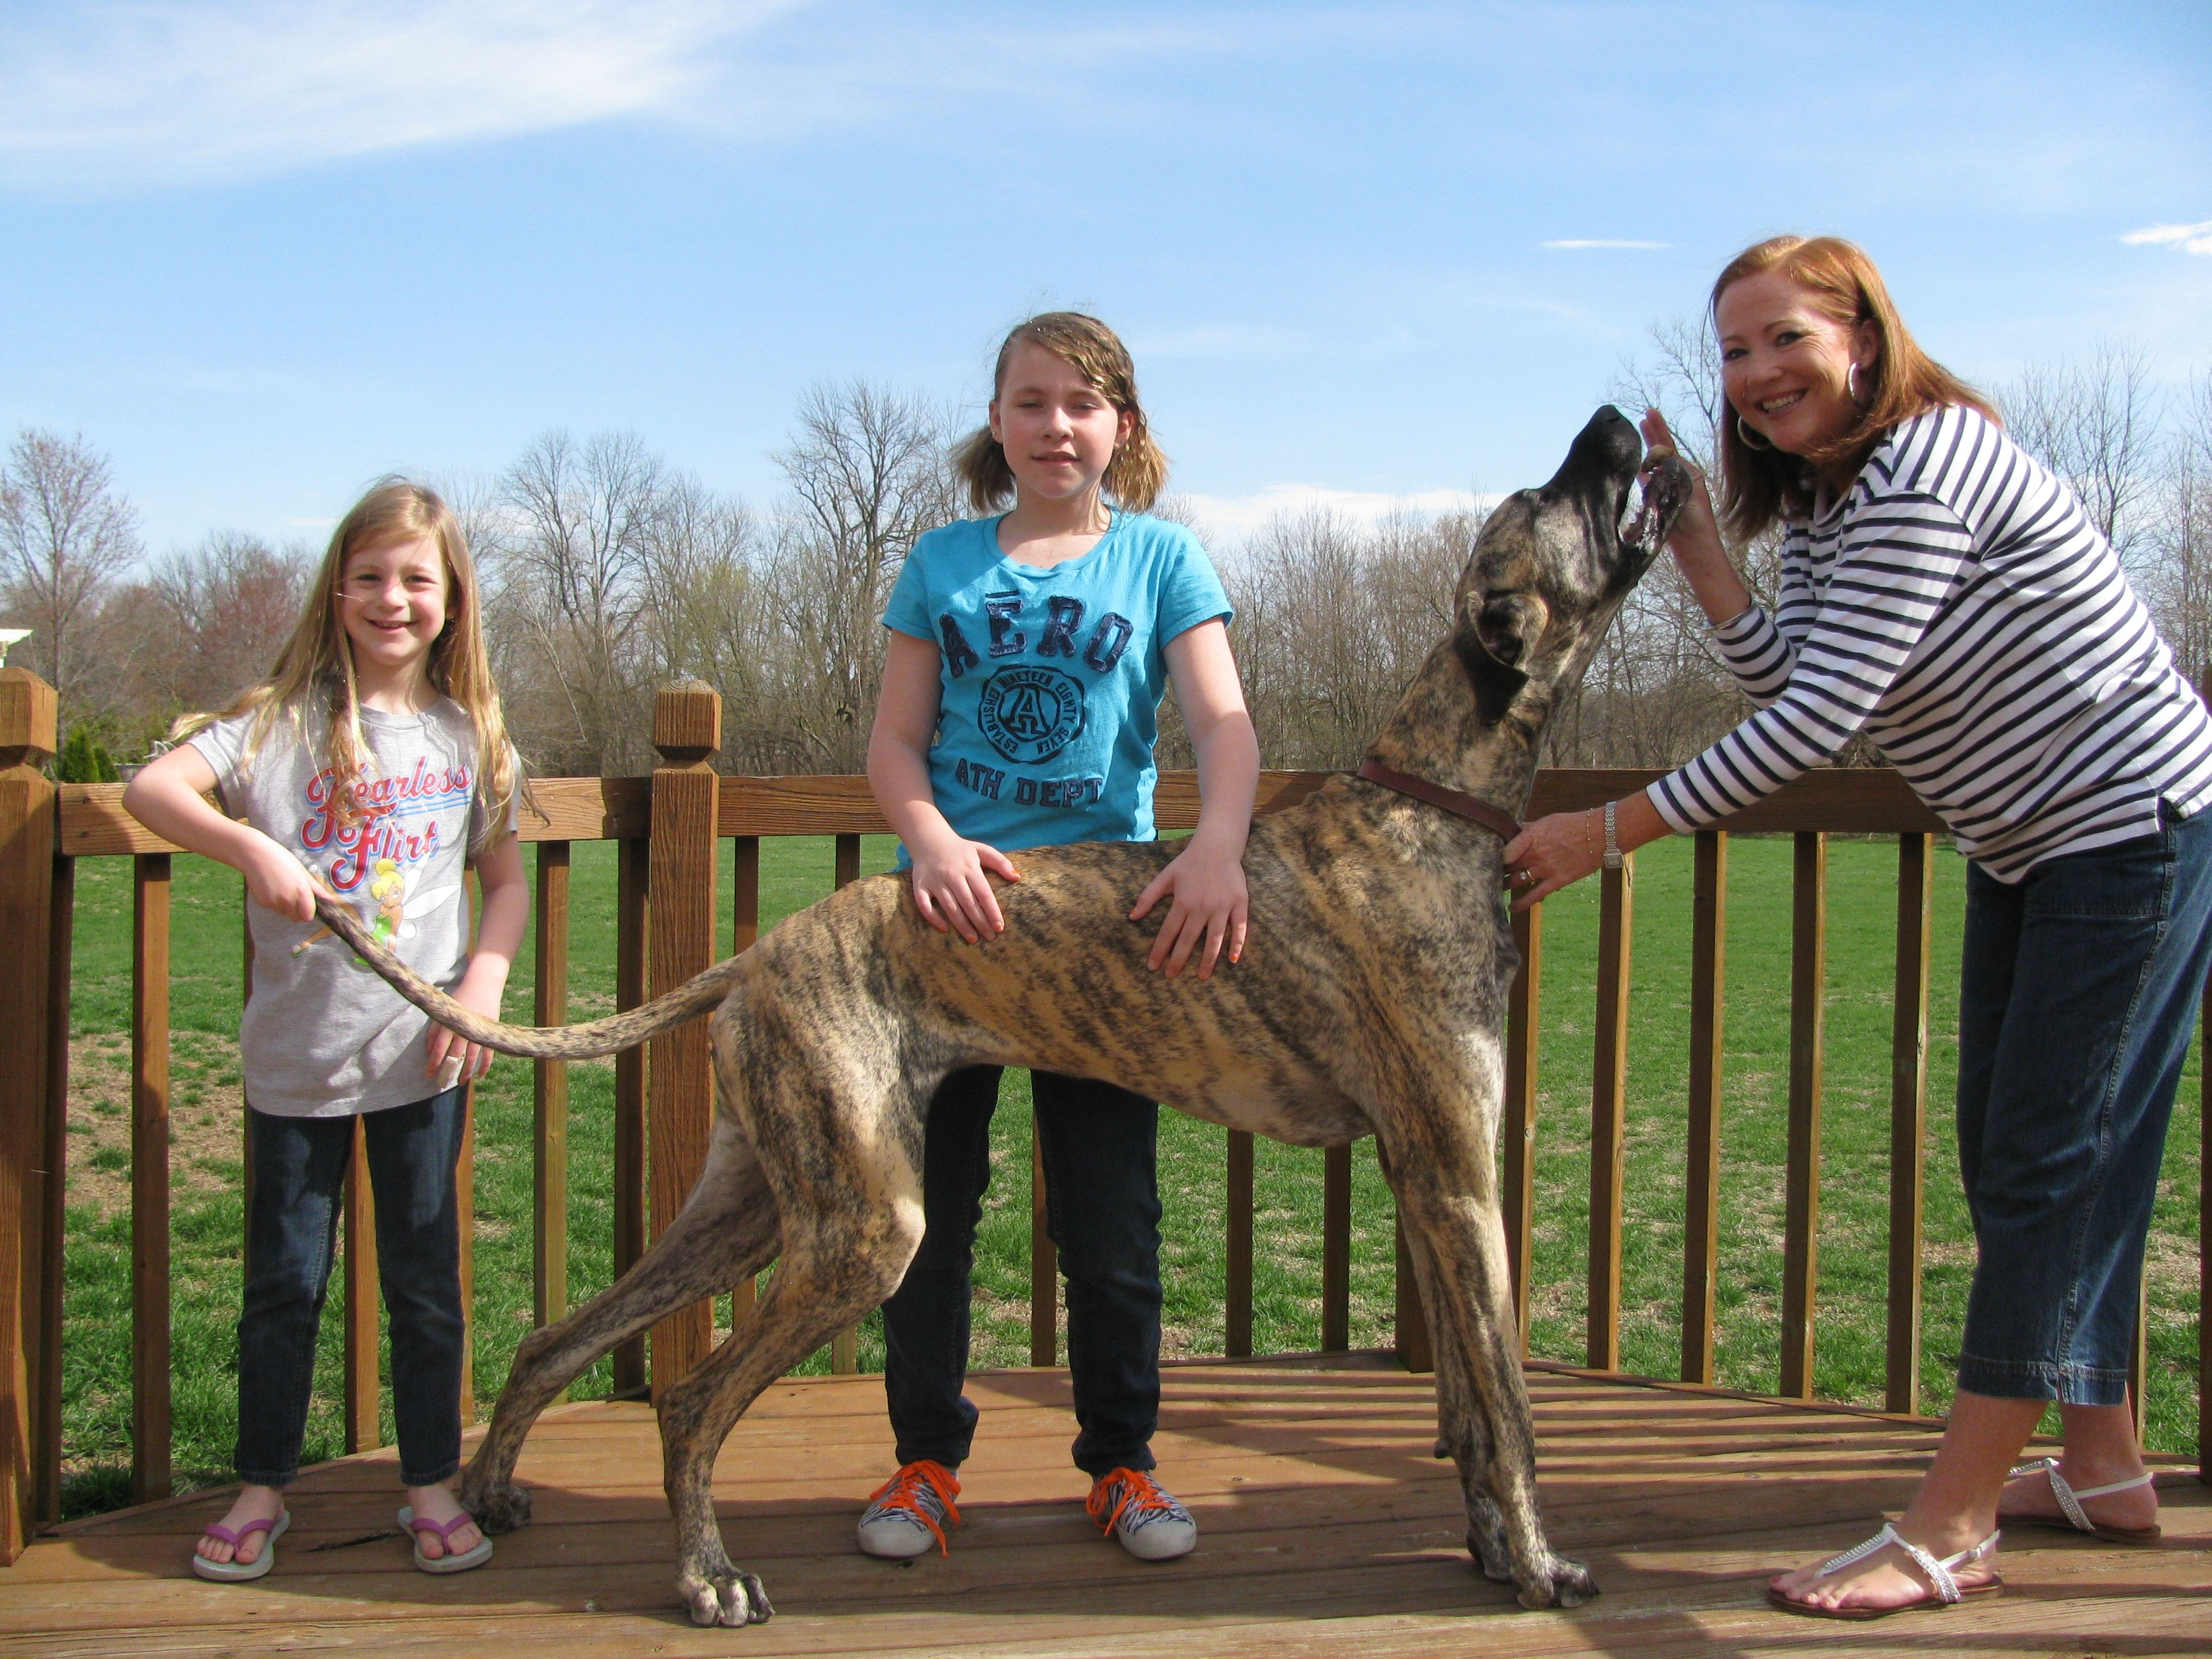 Allie The Great Dane Guinness Book World Record Holder For